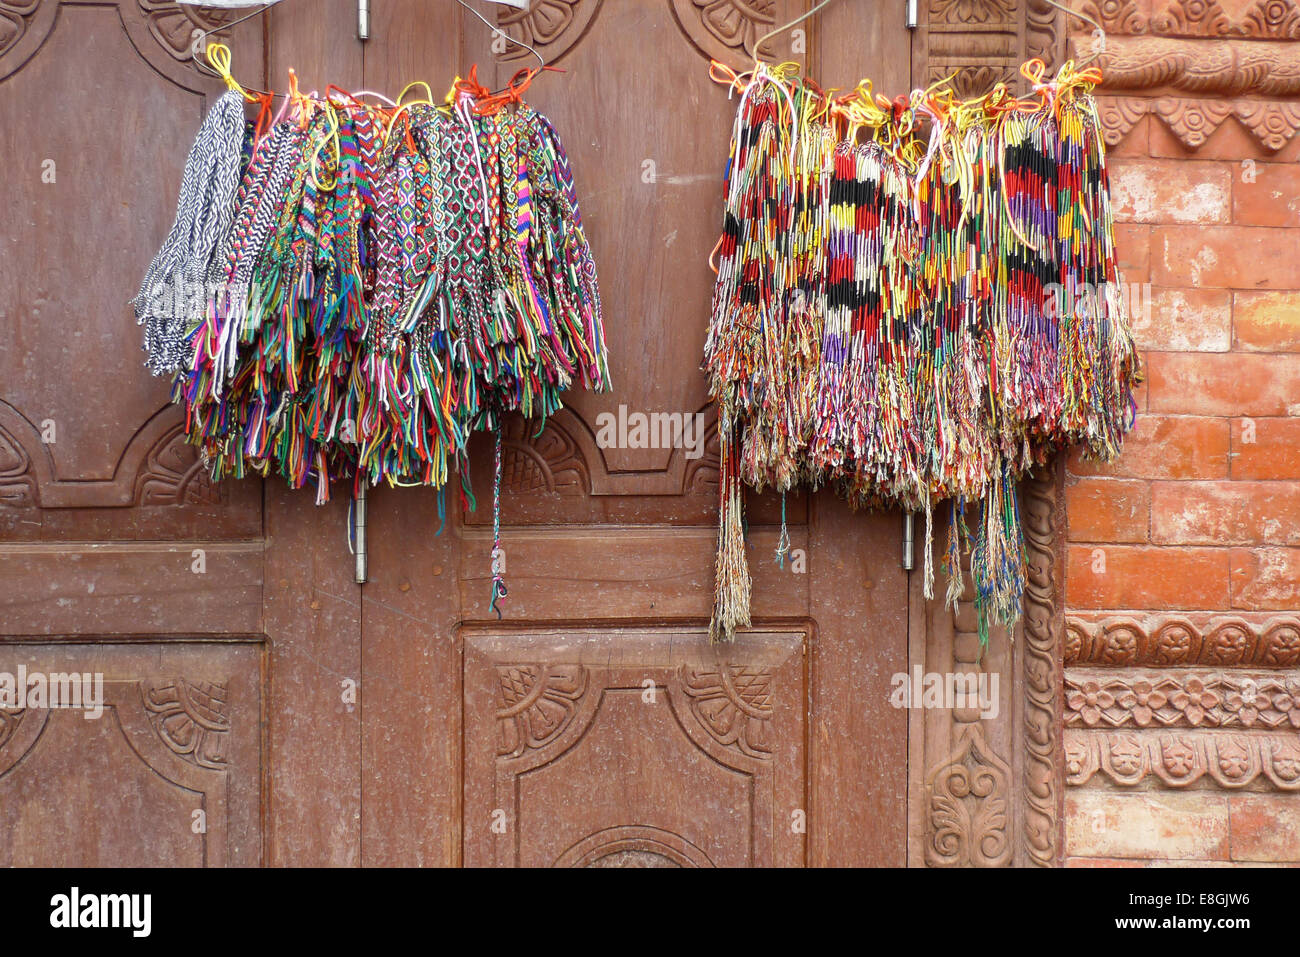 Colorful bracelets - Stock Image